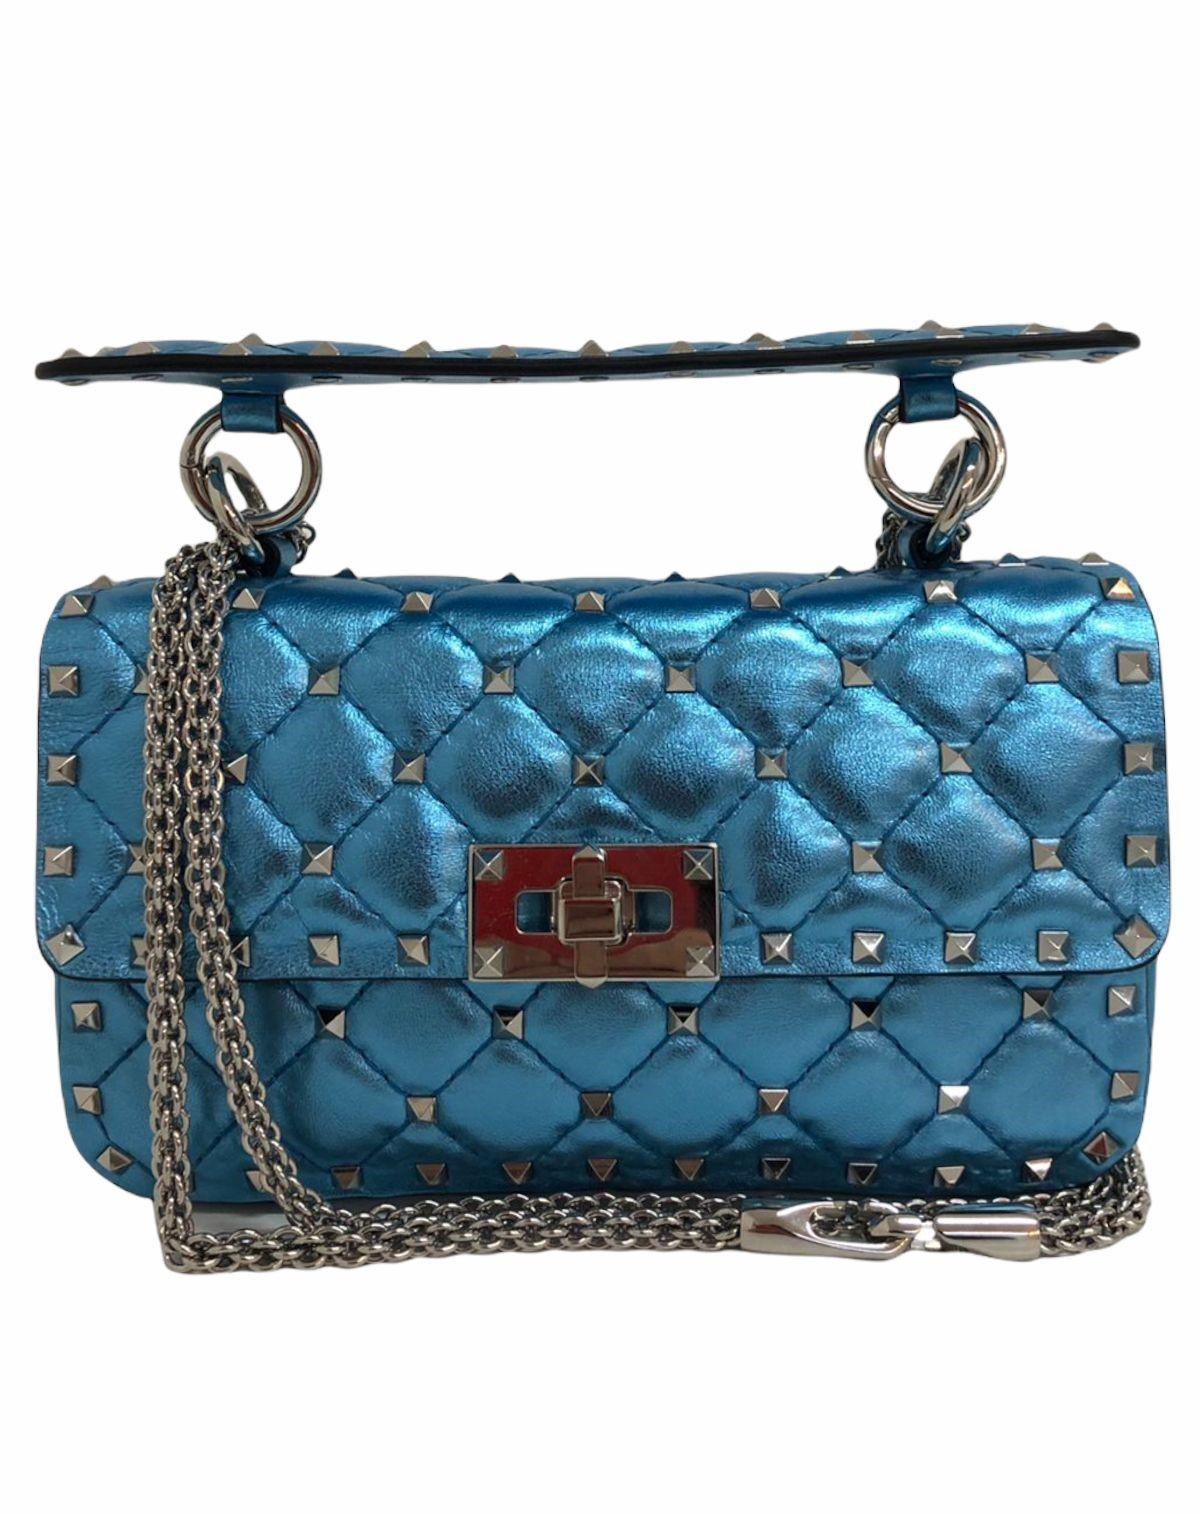 Bolsa Valentino Rockstud Spike Small Azul Metálica